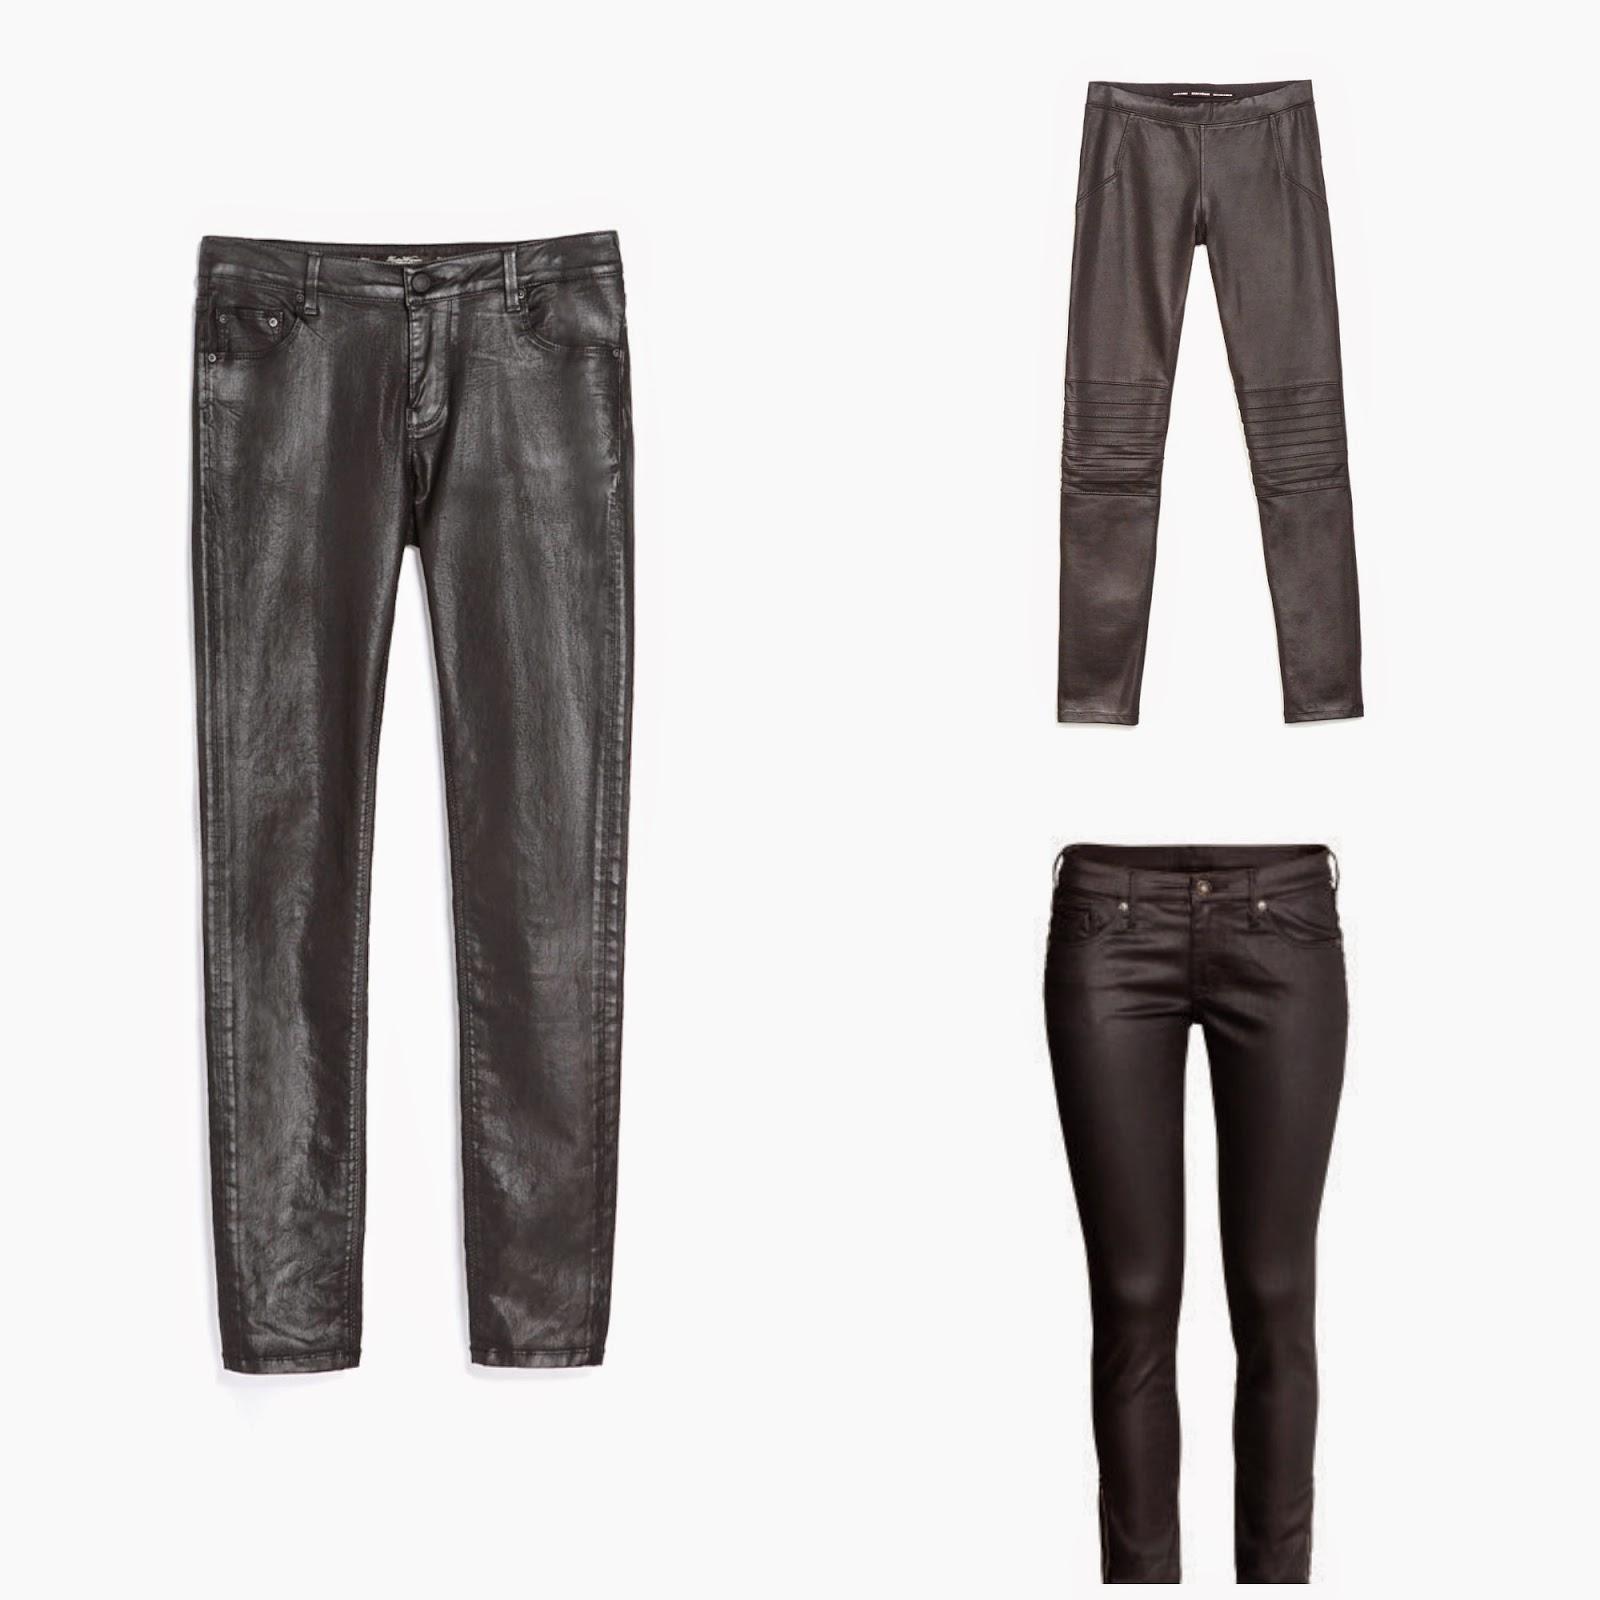 Vaxbyxor, Vaxpants, H&M, Zara